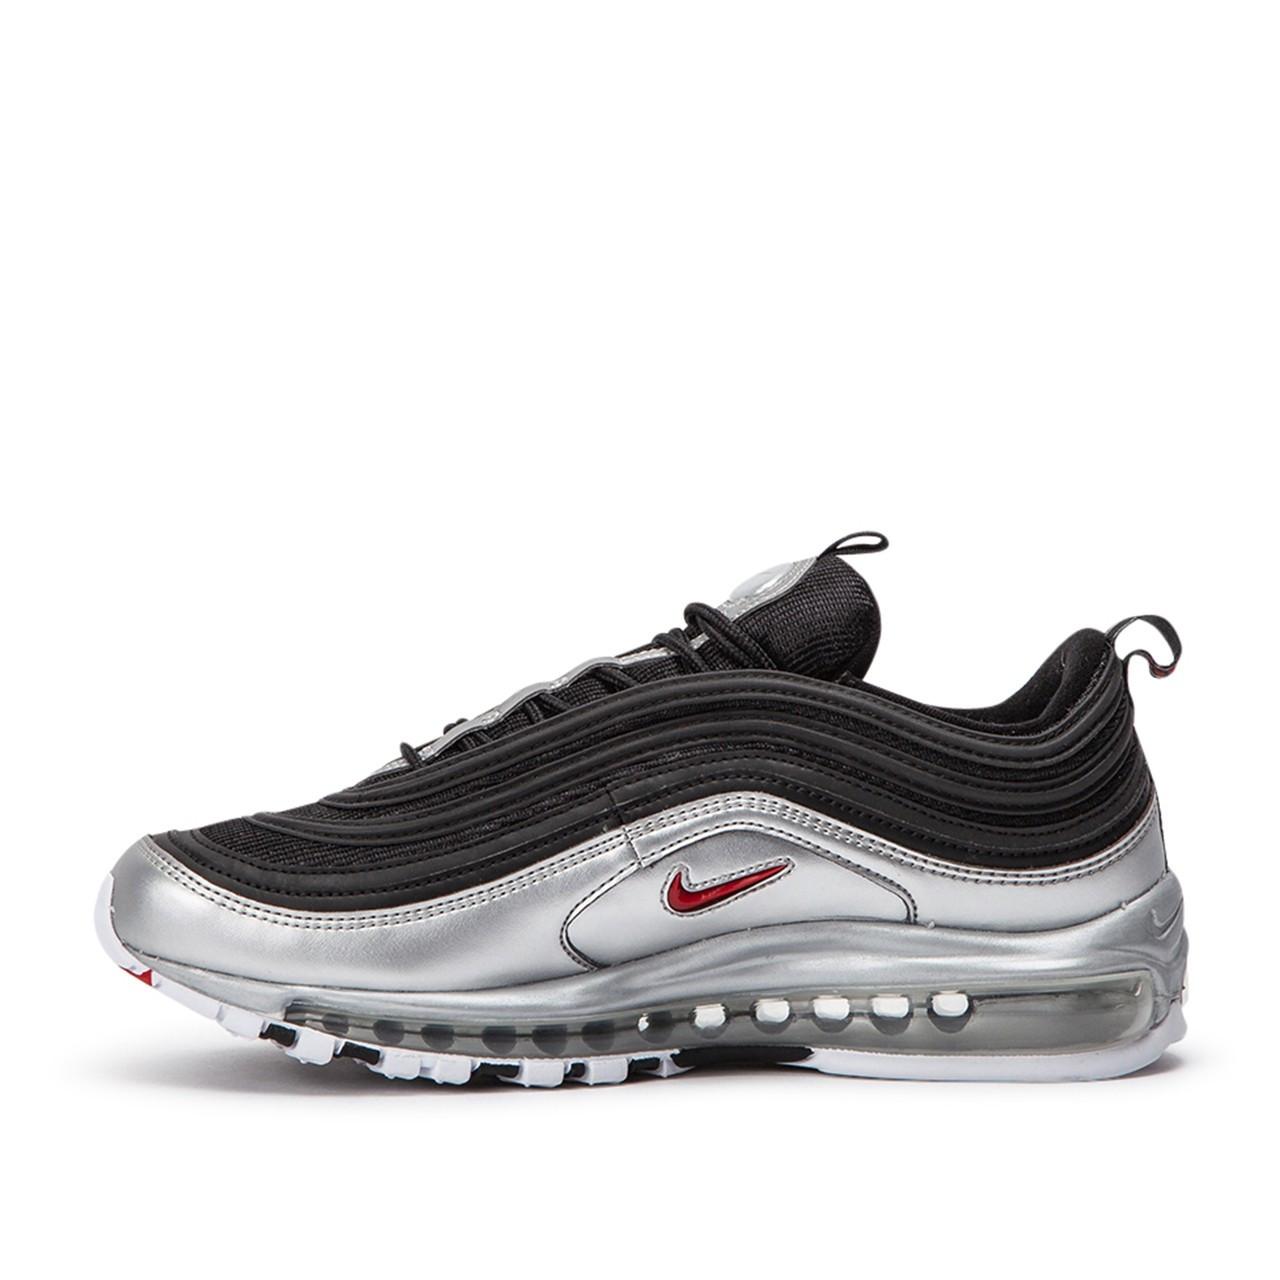 "Кроссовки Nike Air Max 97 QS ""Black/Metallic Silver"""